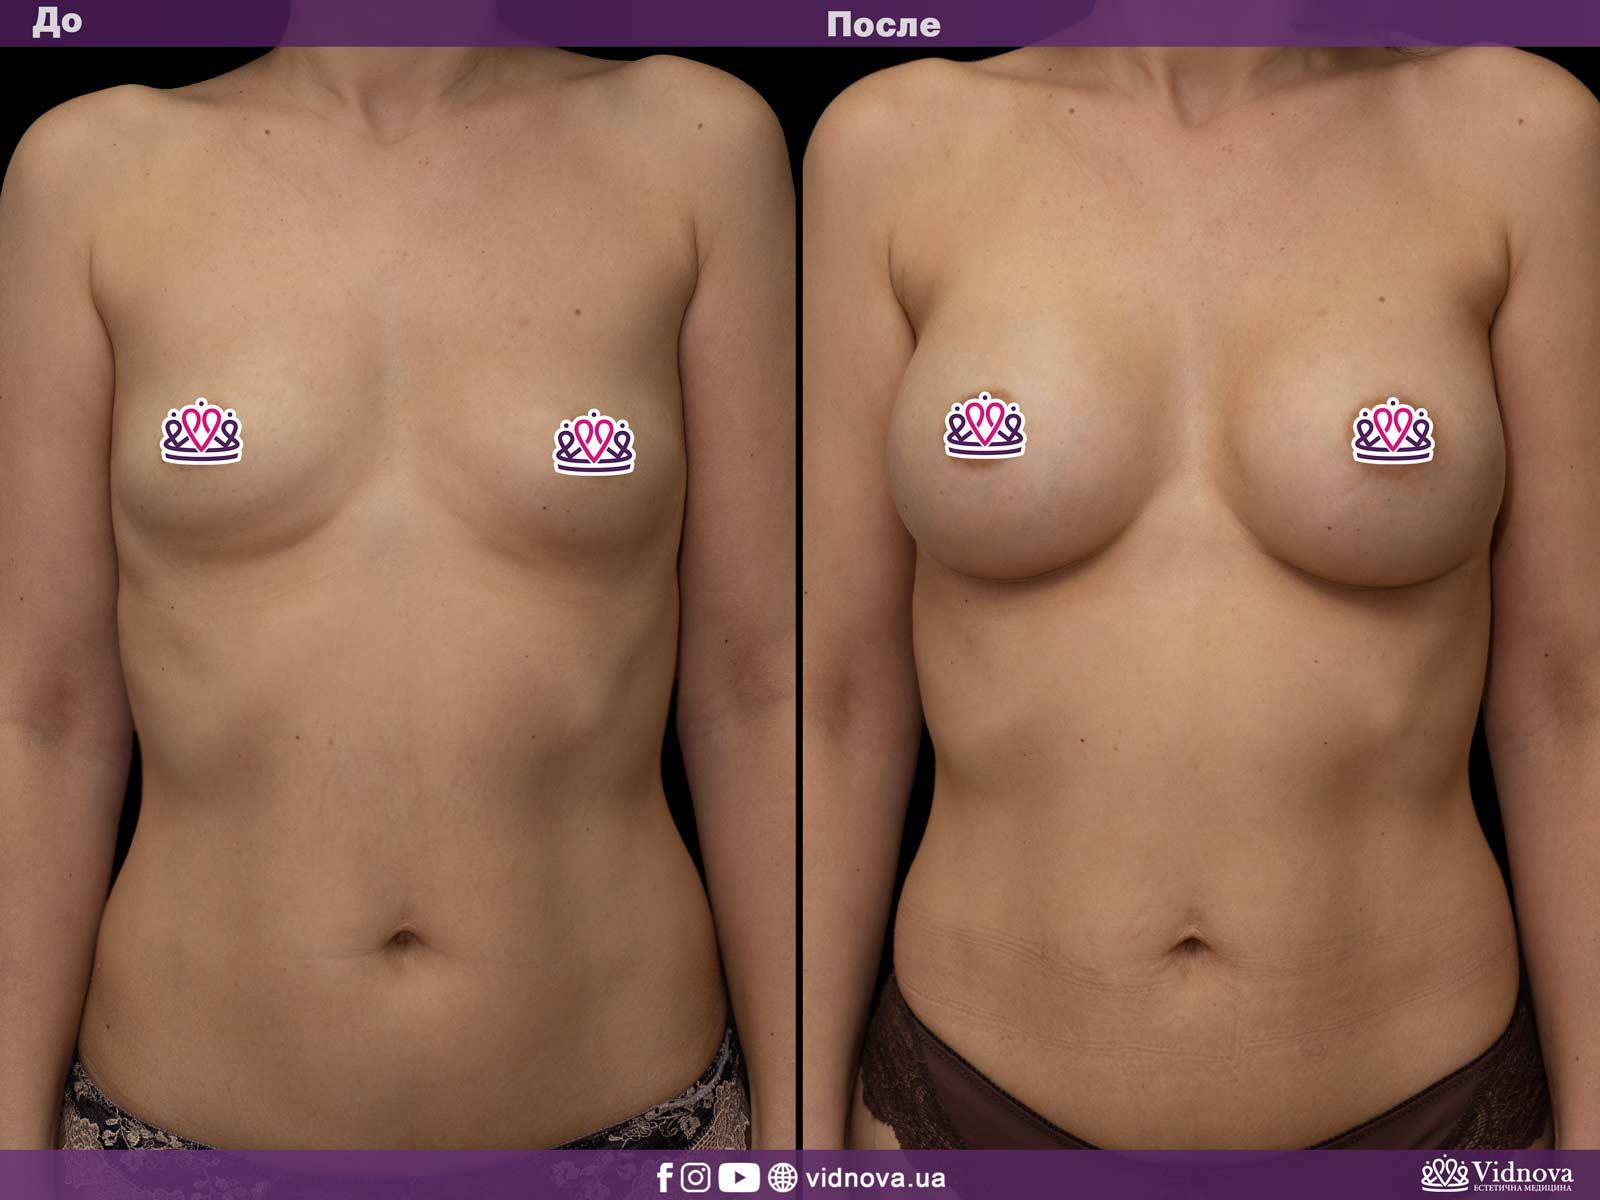 Увеличение груди: Фото ДО и ПОСЛЕ - Пример №9-1 - Клиника Vidnova